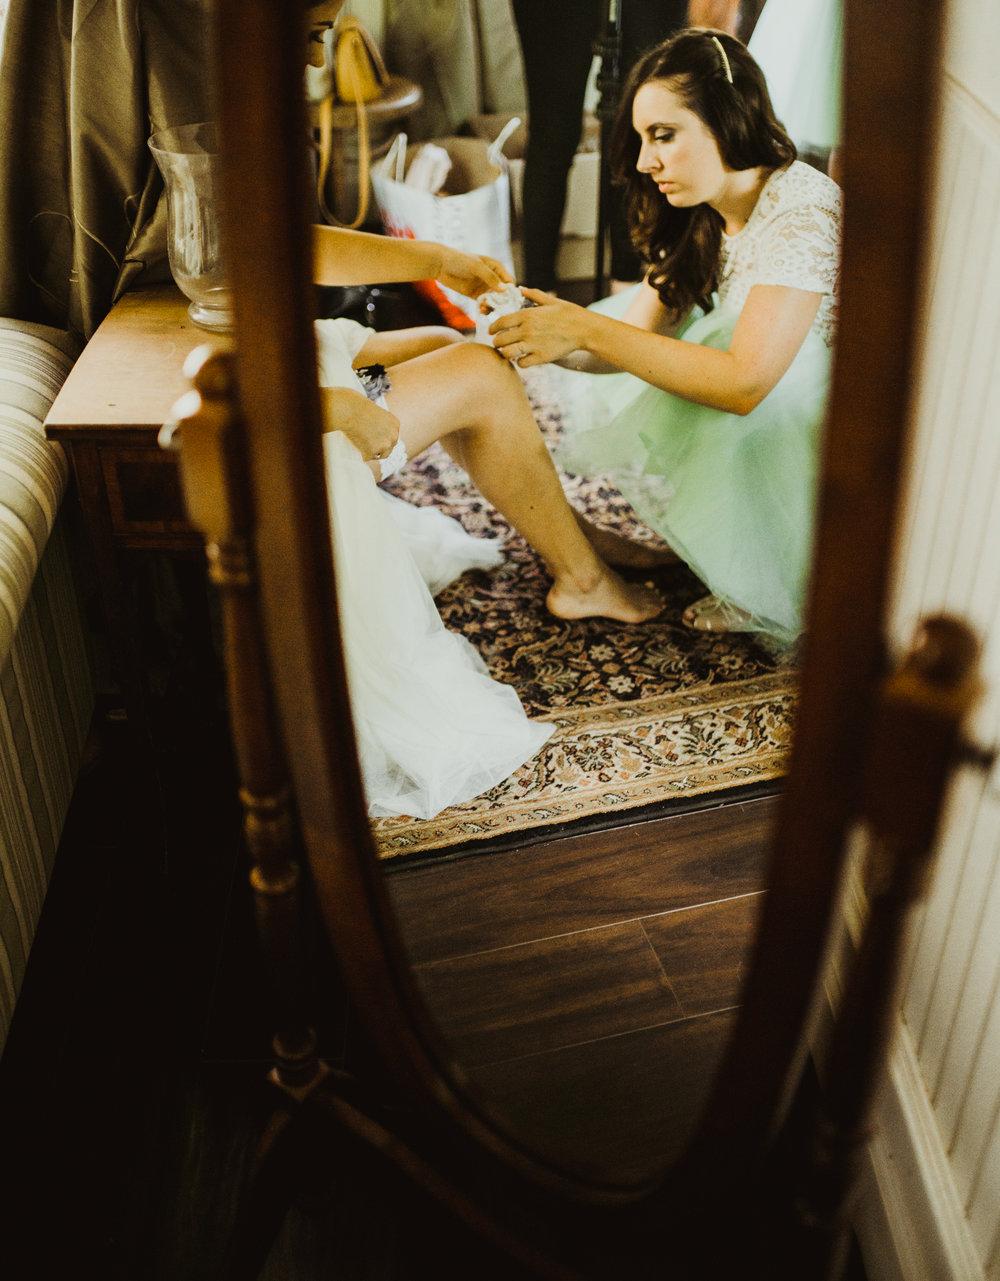 ©Isaiah + Taylor Photography - Brendan + Stefana, Quail Haven Farm Wedding, Vista-21.jpg